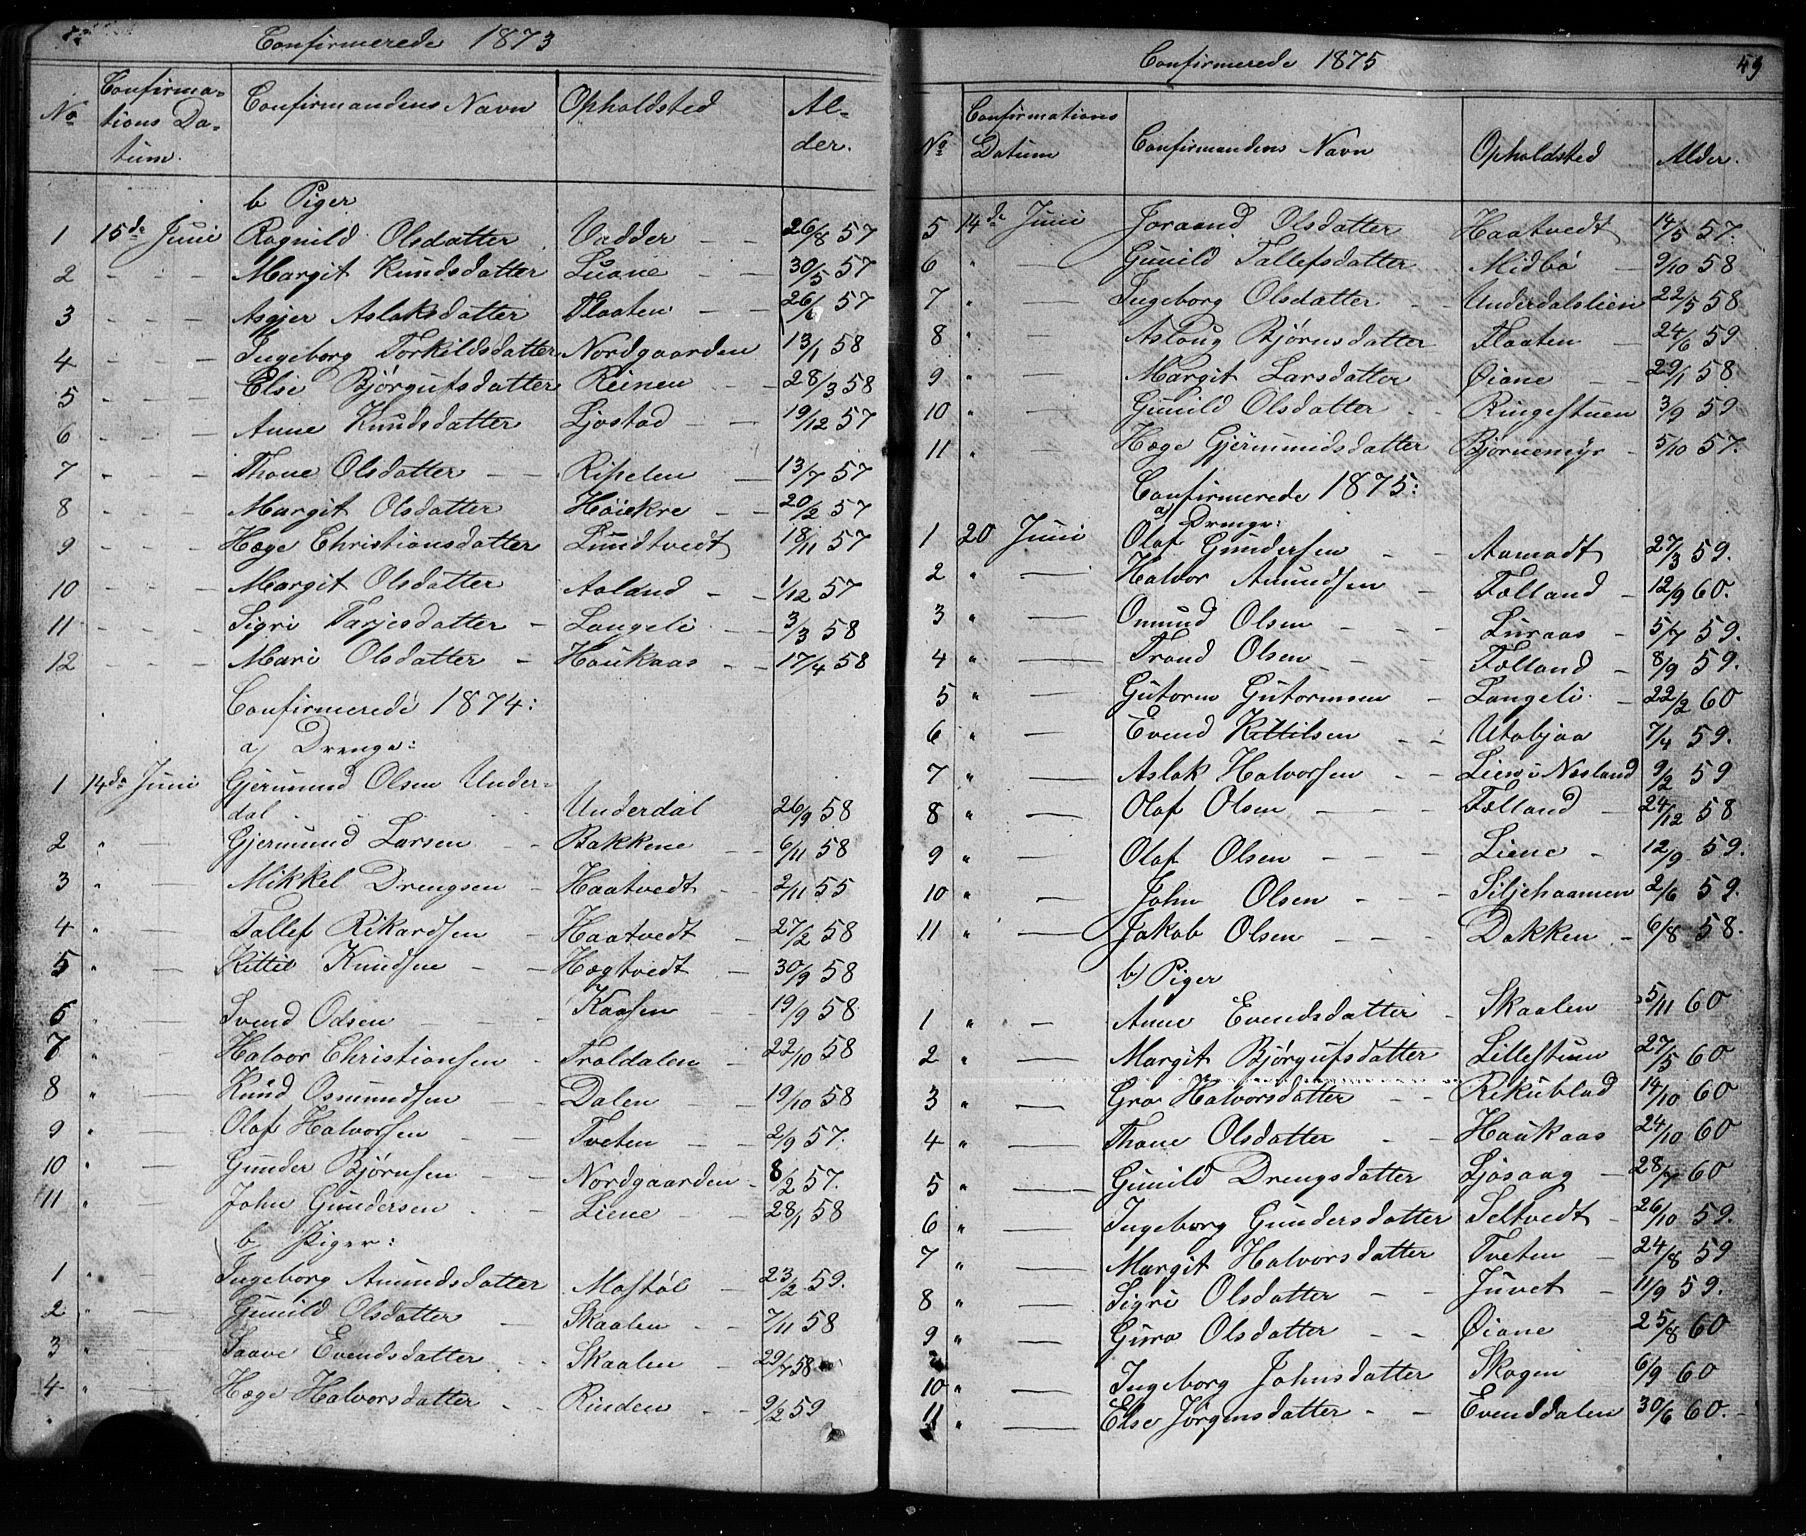 SAKO, Mo kirkebøker, G/Ga/L0001: Klokkerbok nr. I 1, 1851-1891, s. 49